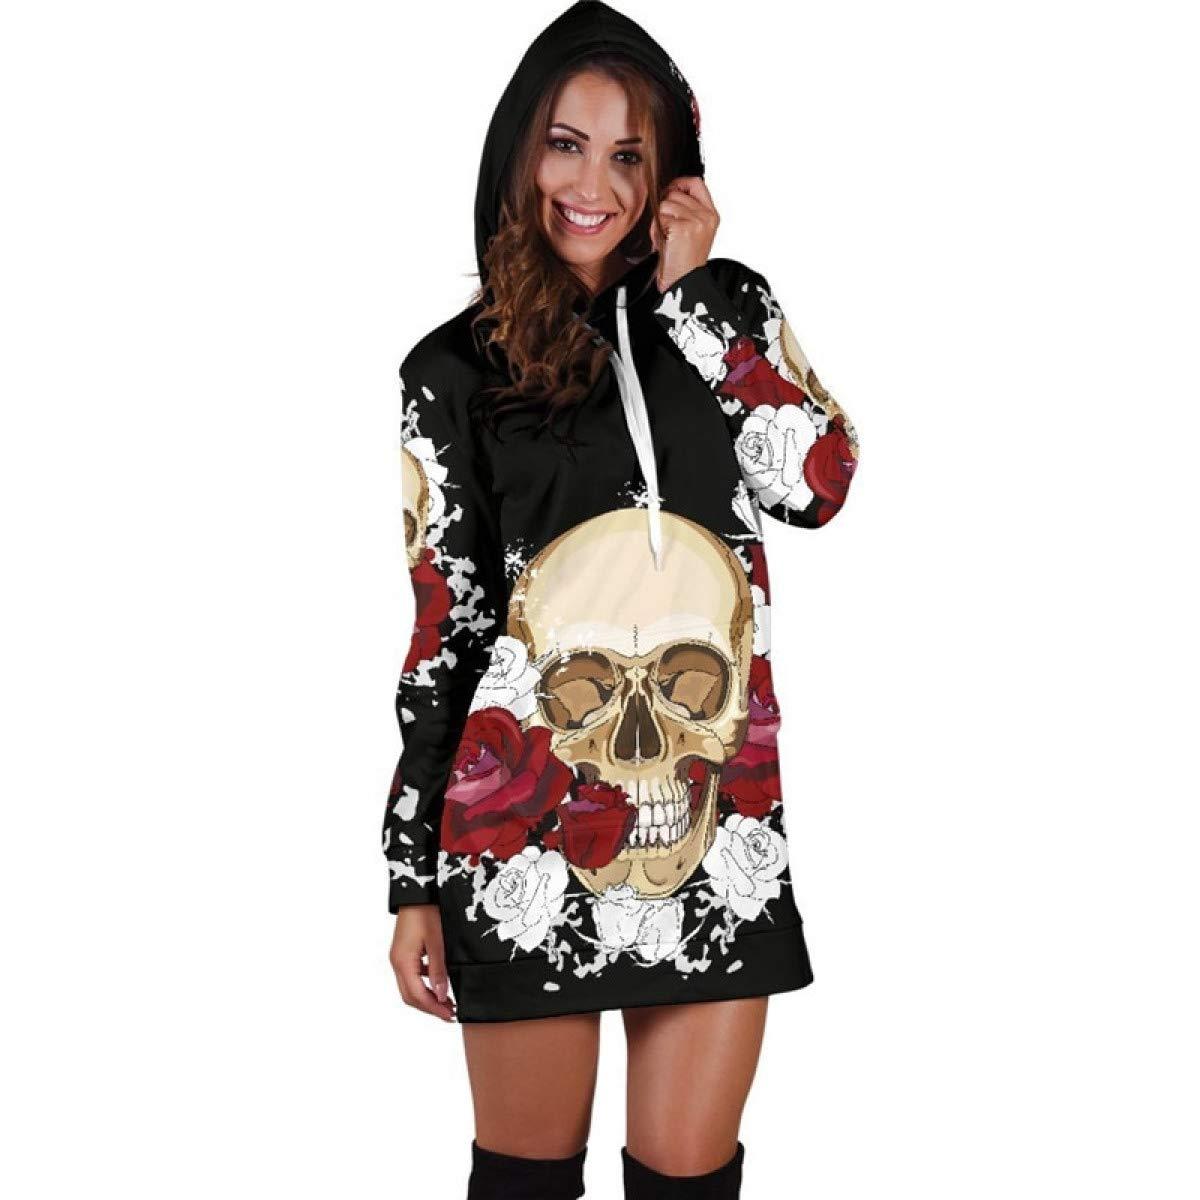 Amazon.com: FLAMINGO_STORE Sweatshirts for Women Hoodies Women Sweatshirt Pullover Tracksuits Streetwear: Clothing